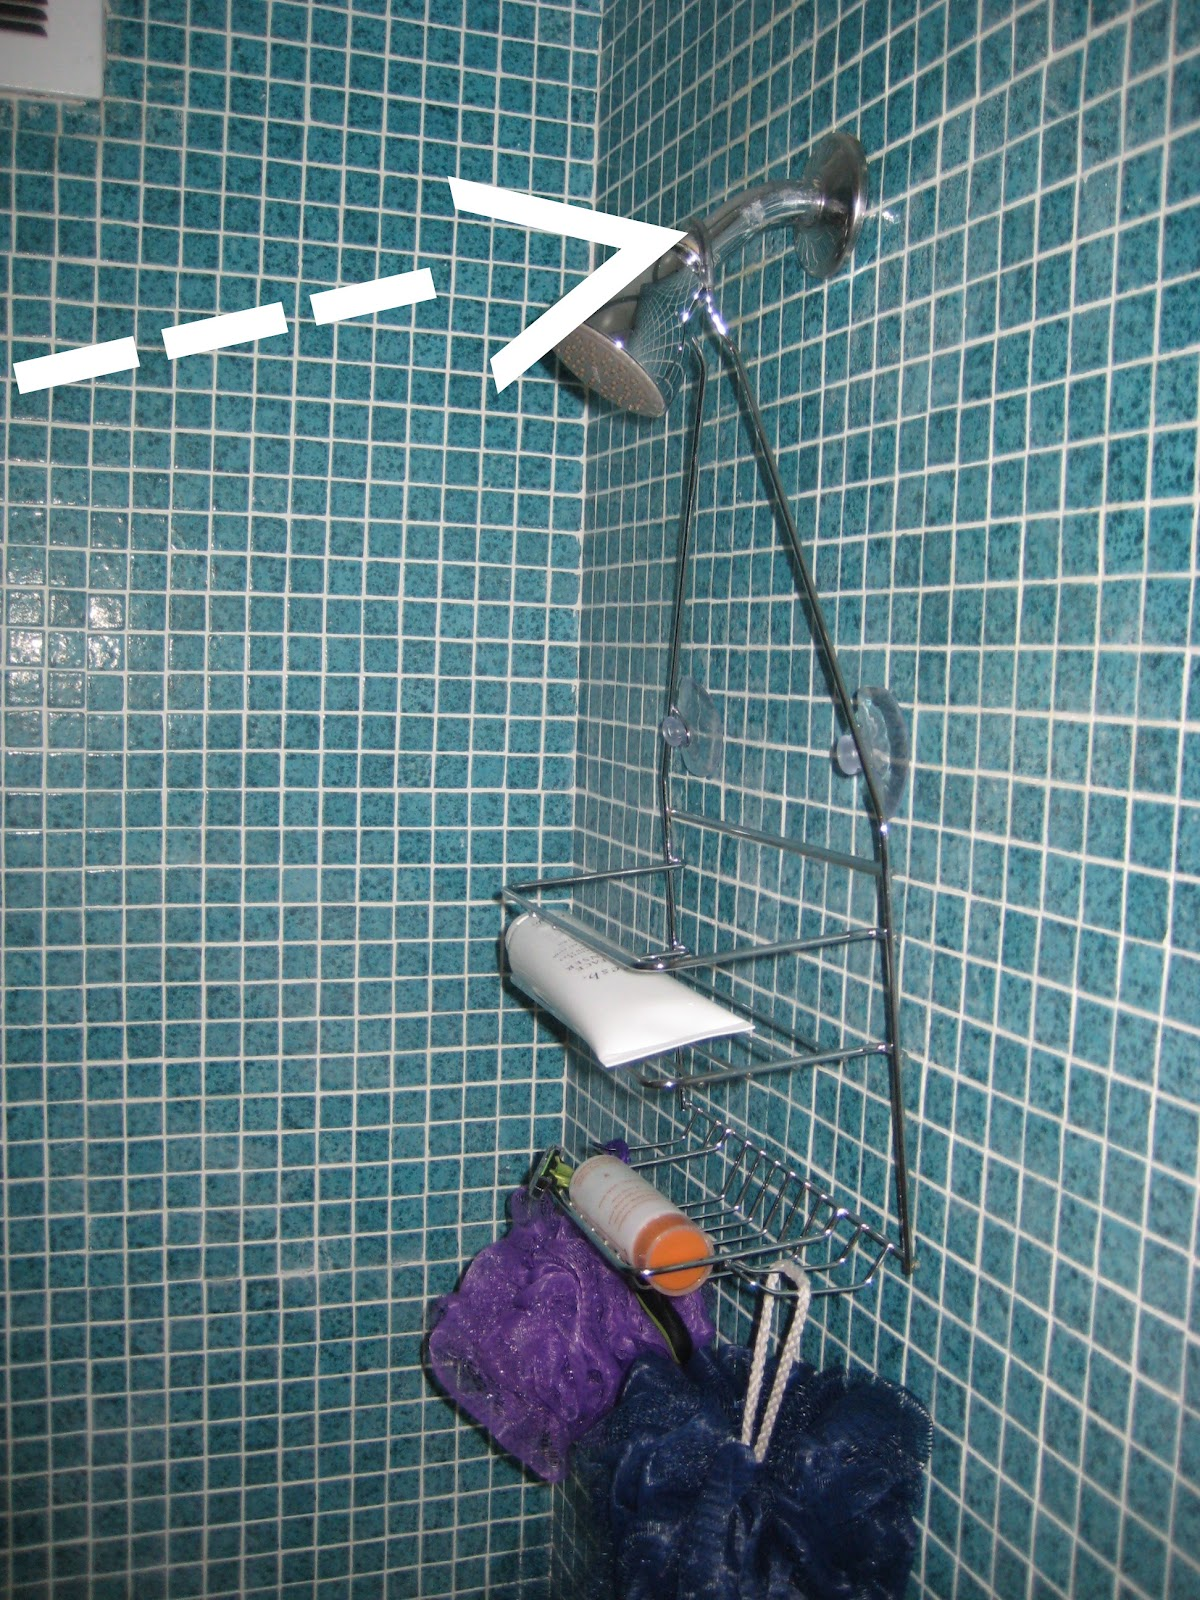 3 Tricks Thursday Shower Caddy Shade